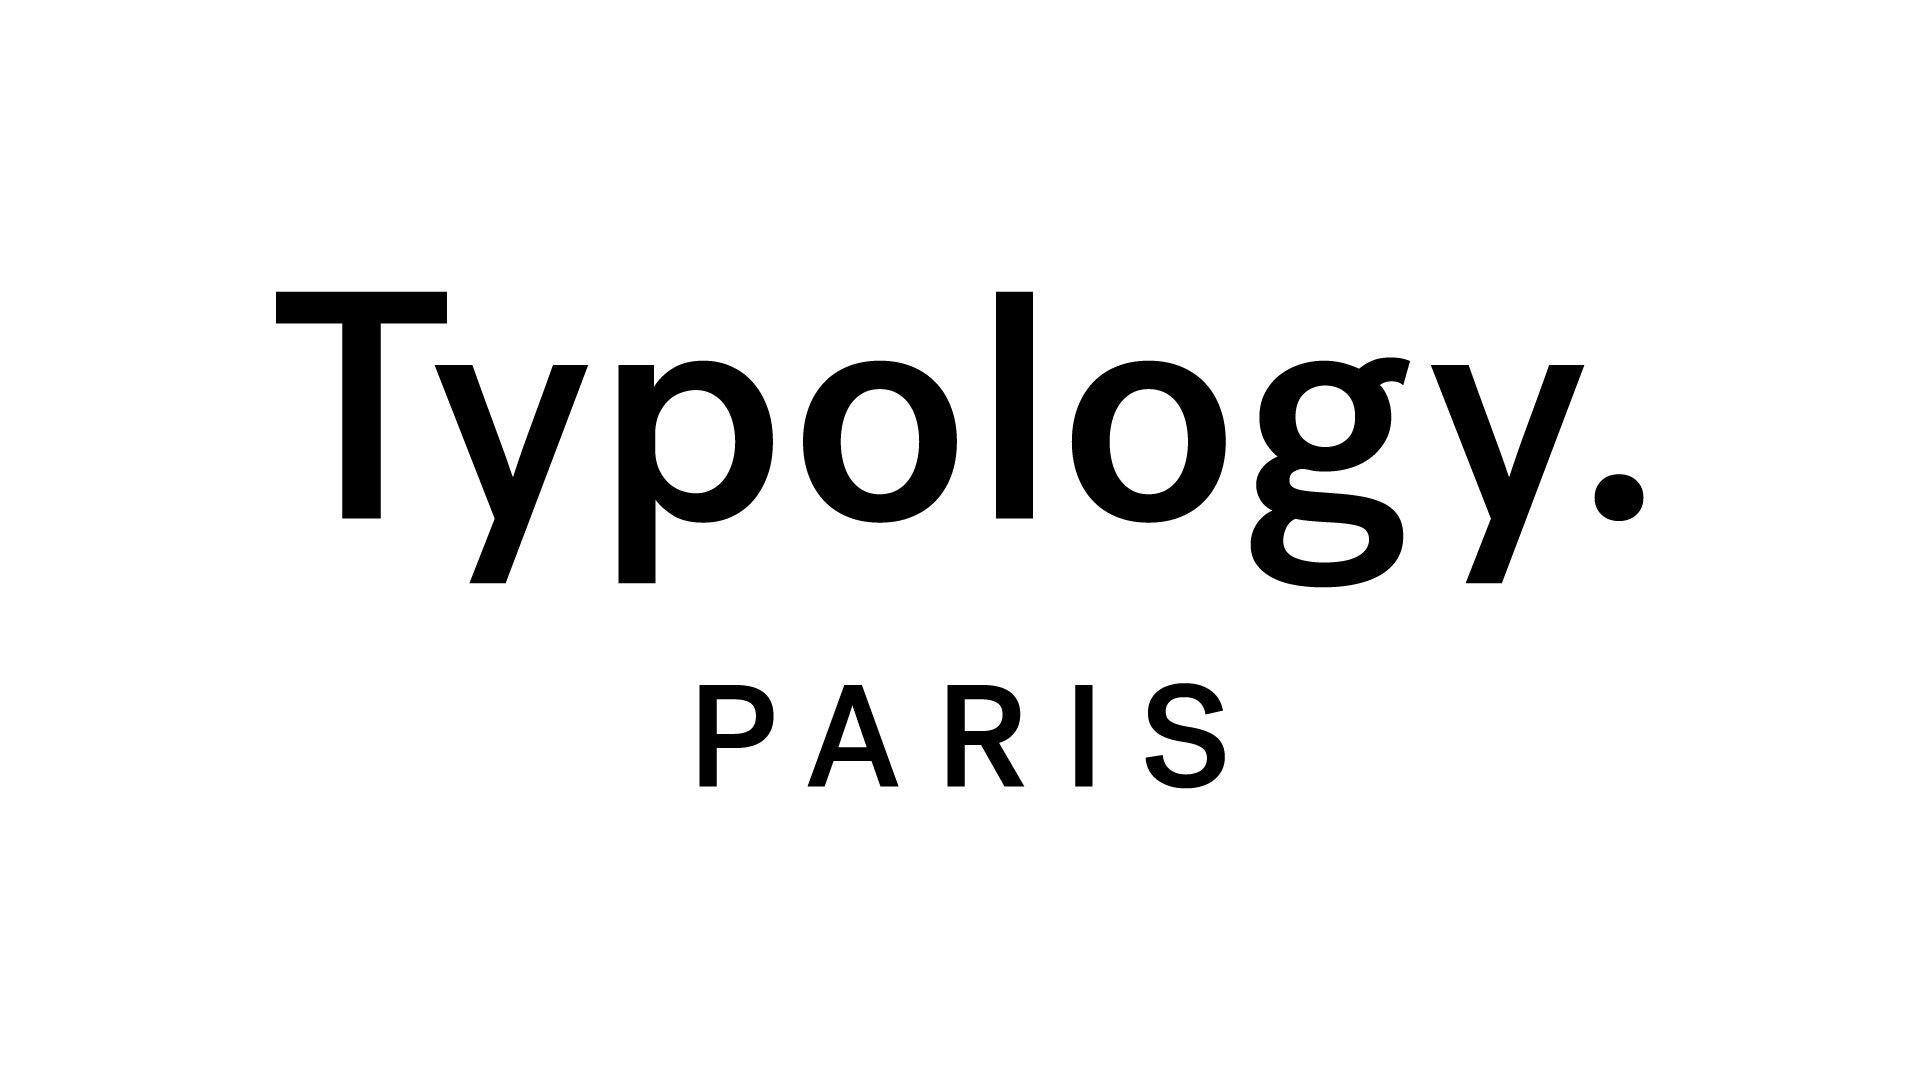 Typology logo